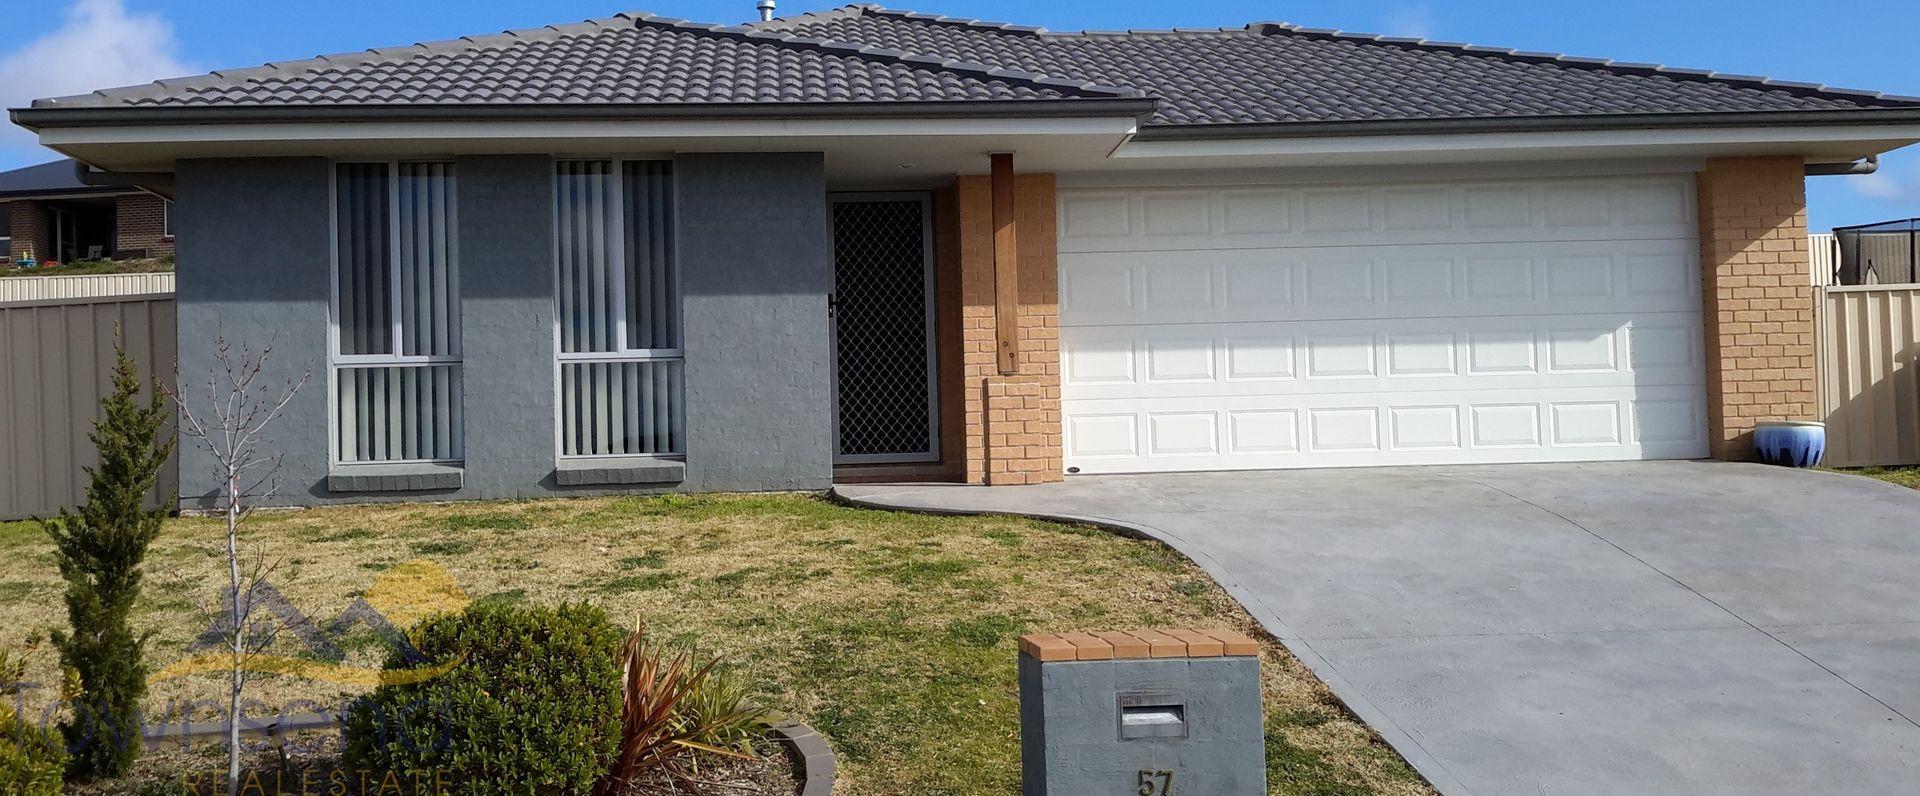 57 Honeyman Drive, Orange NSW 2800, Image 0